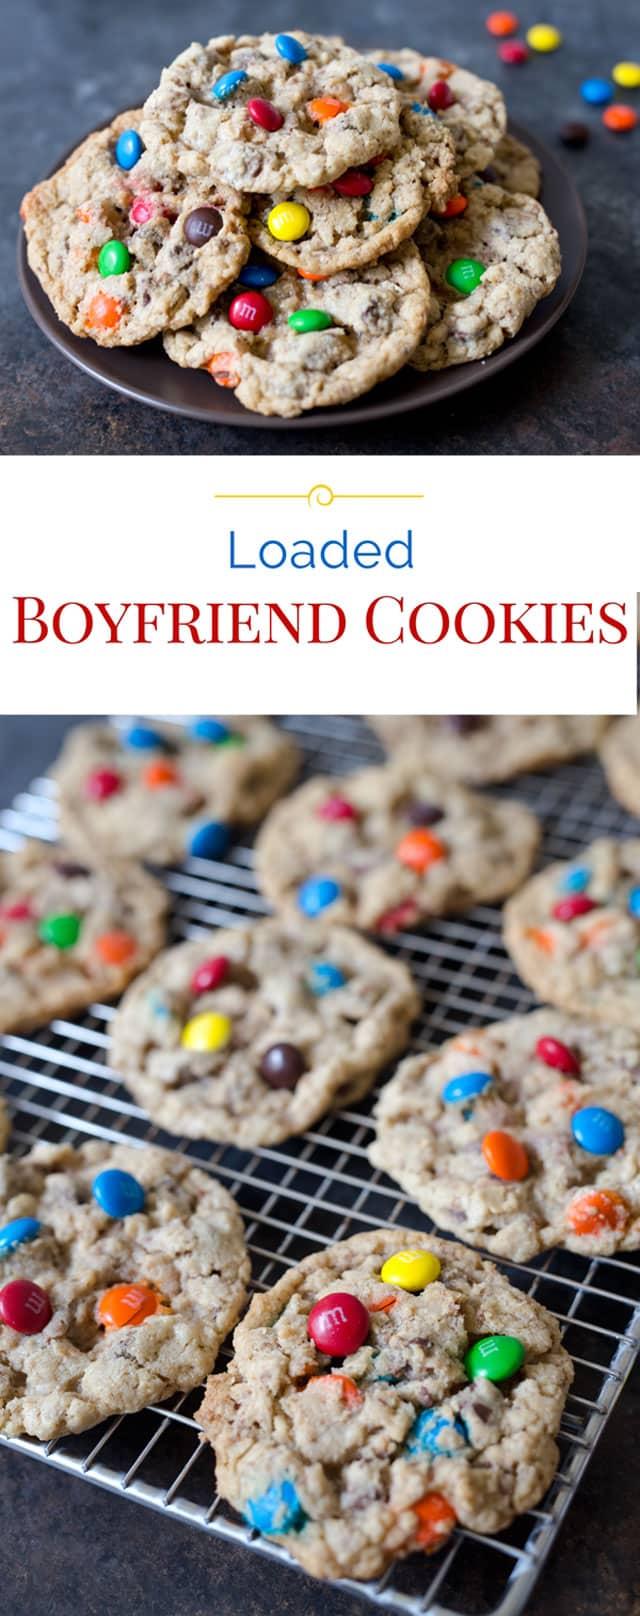 Boyfriend-Cookies-Collage-2-Barbara-Bakes